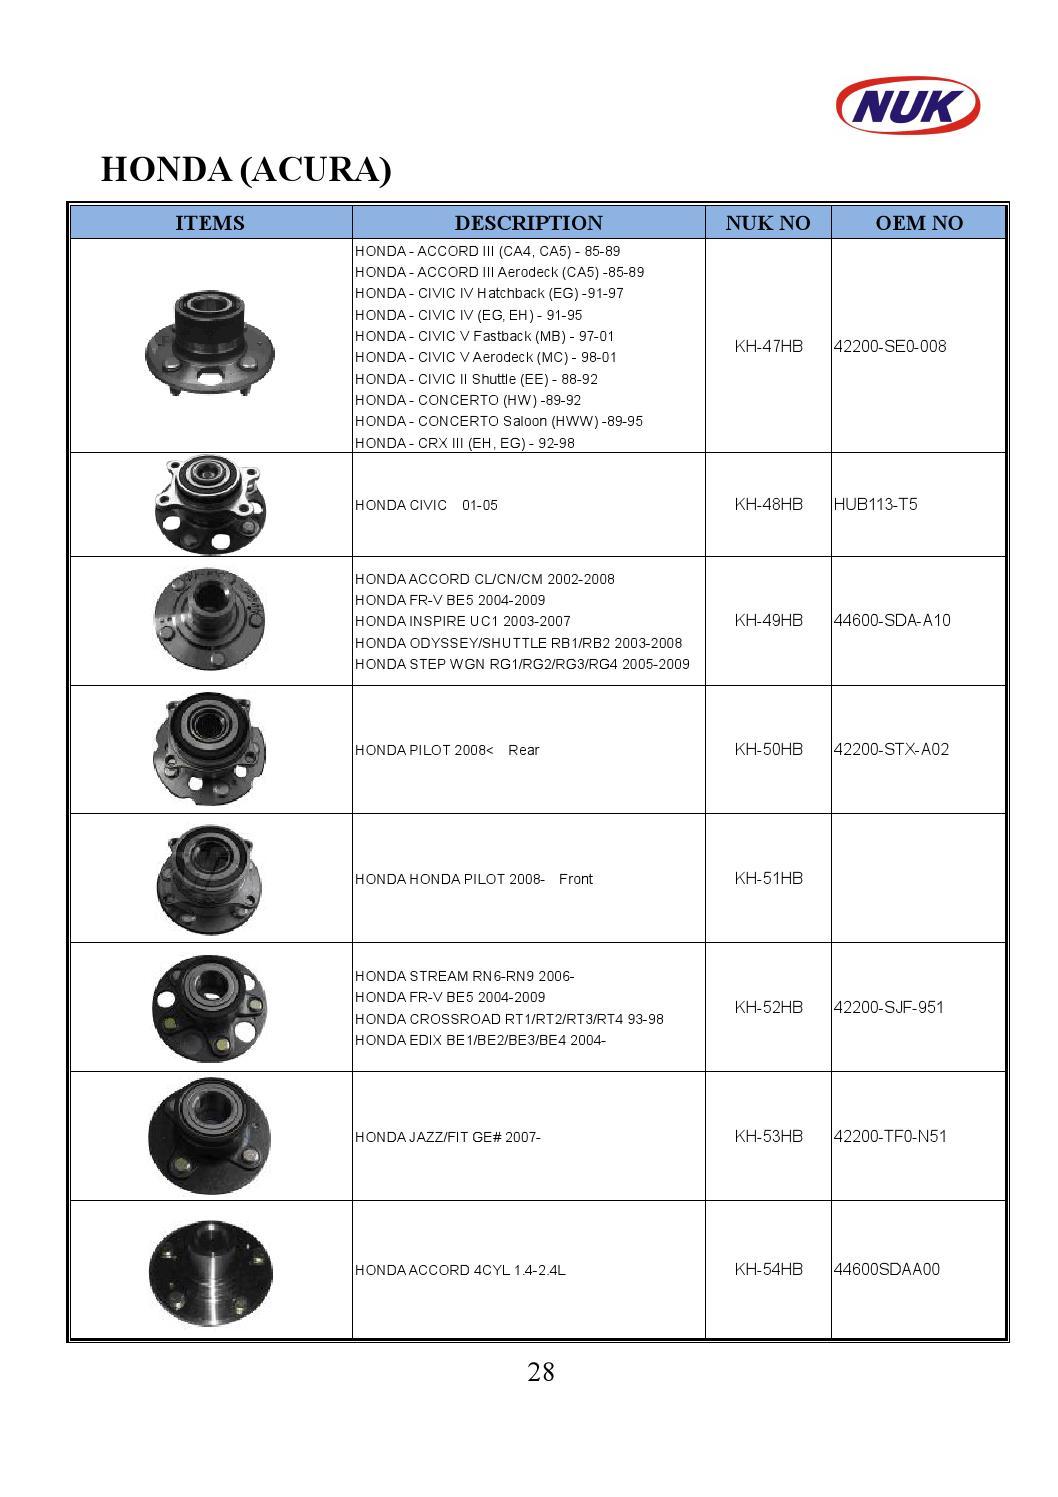 Acura 44600-SDA-A00 Wheel Hub